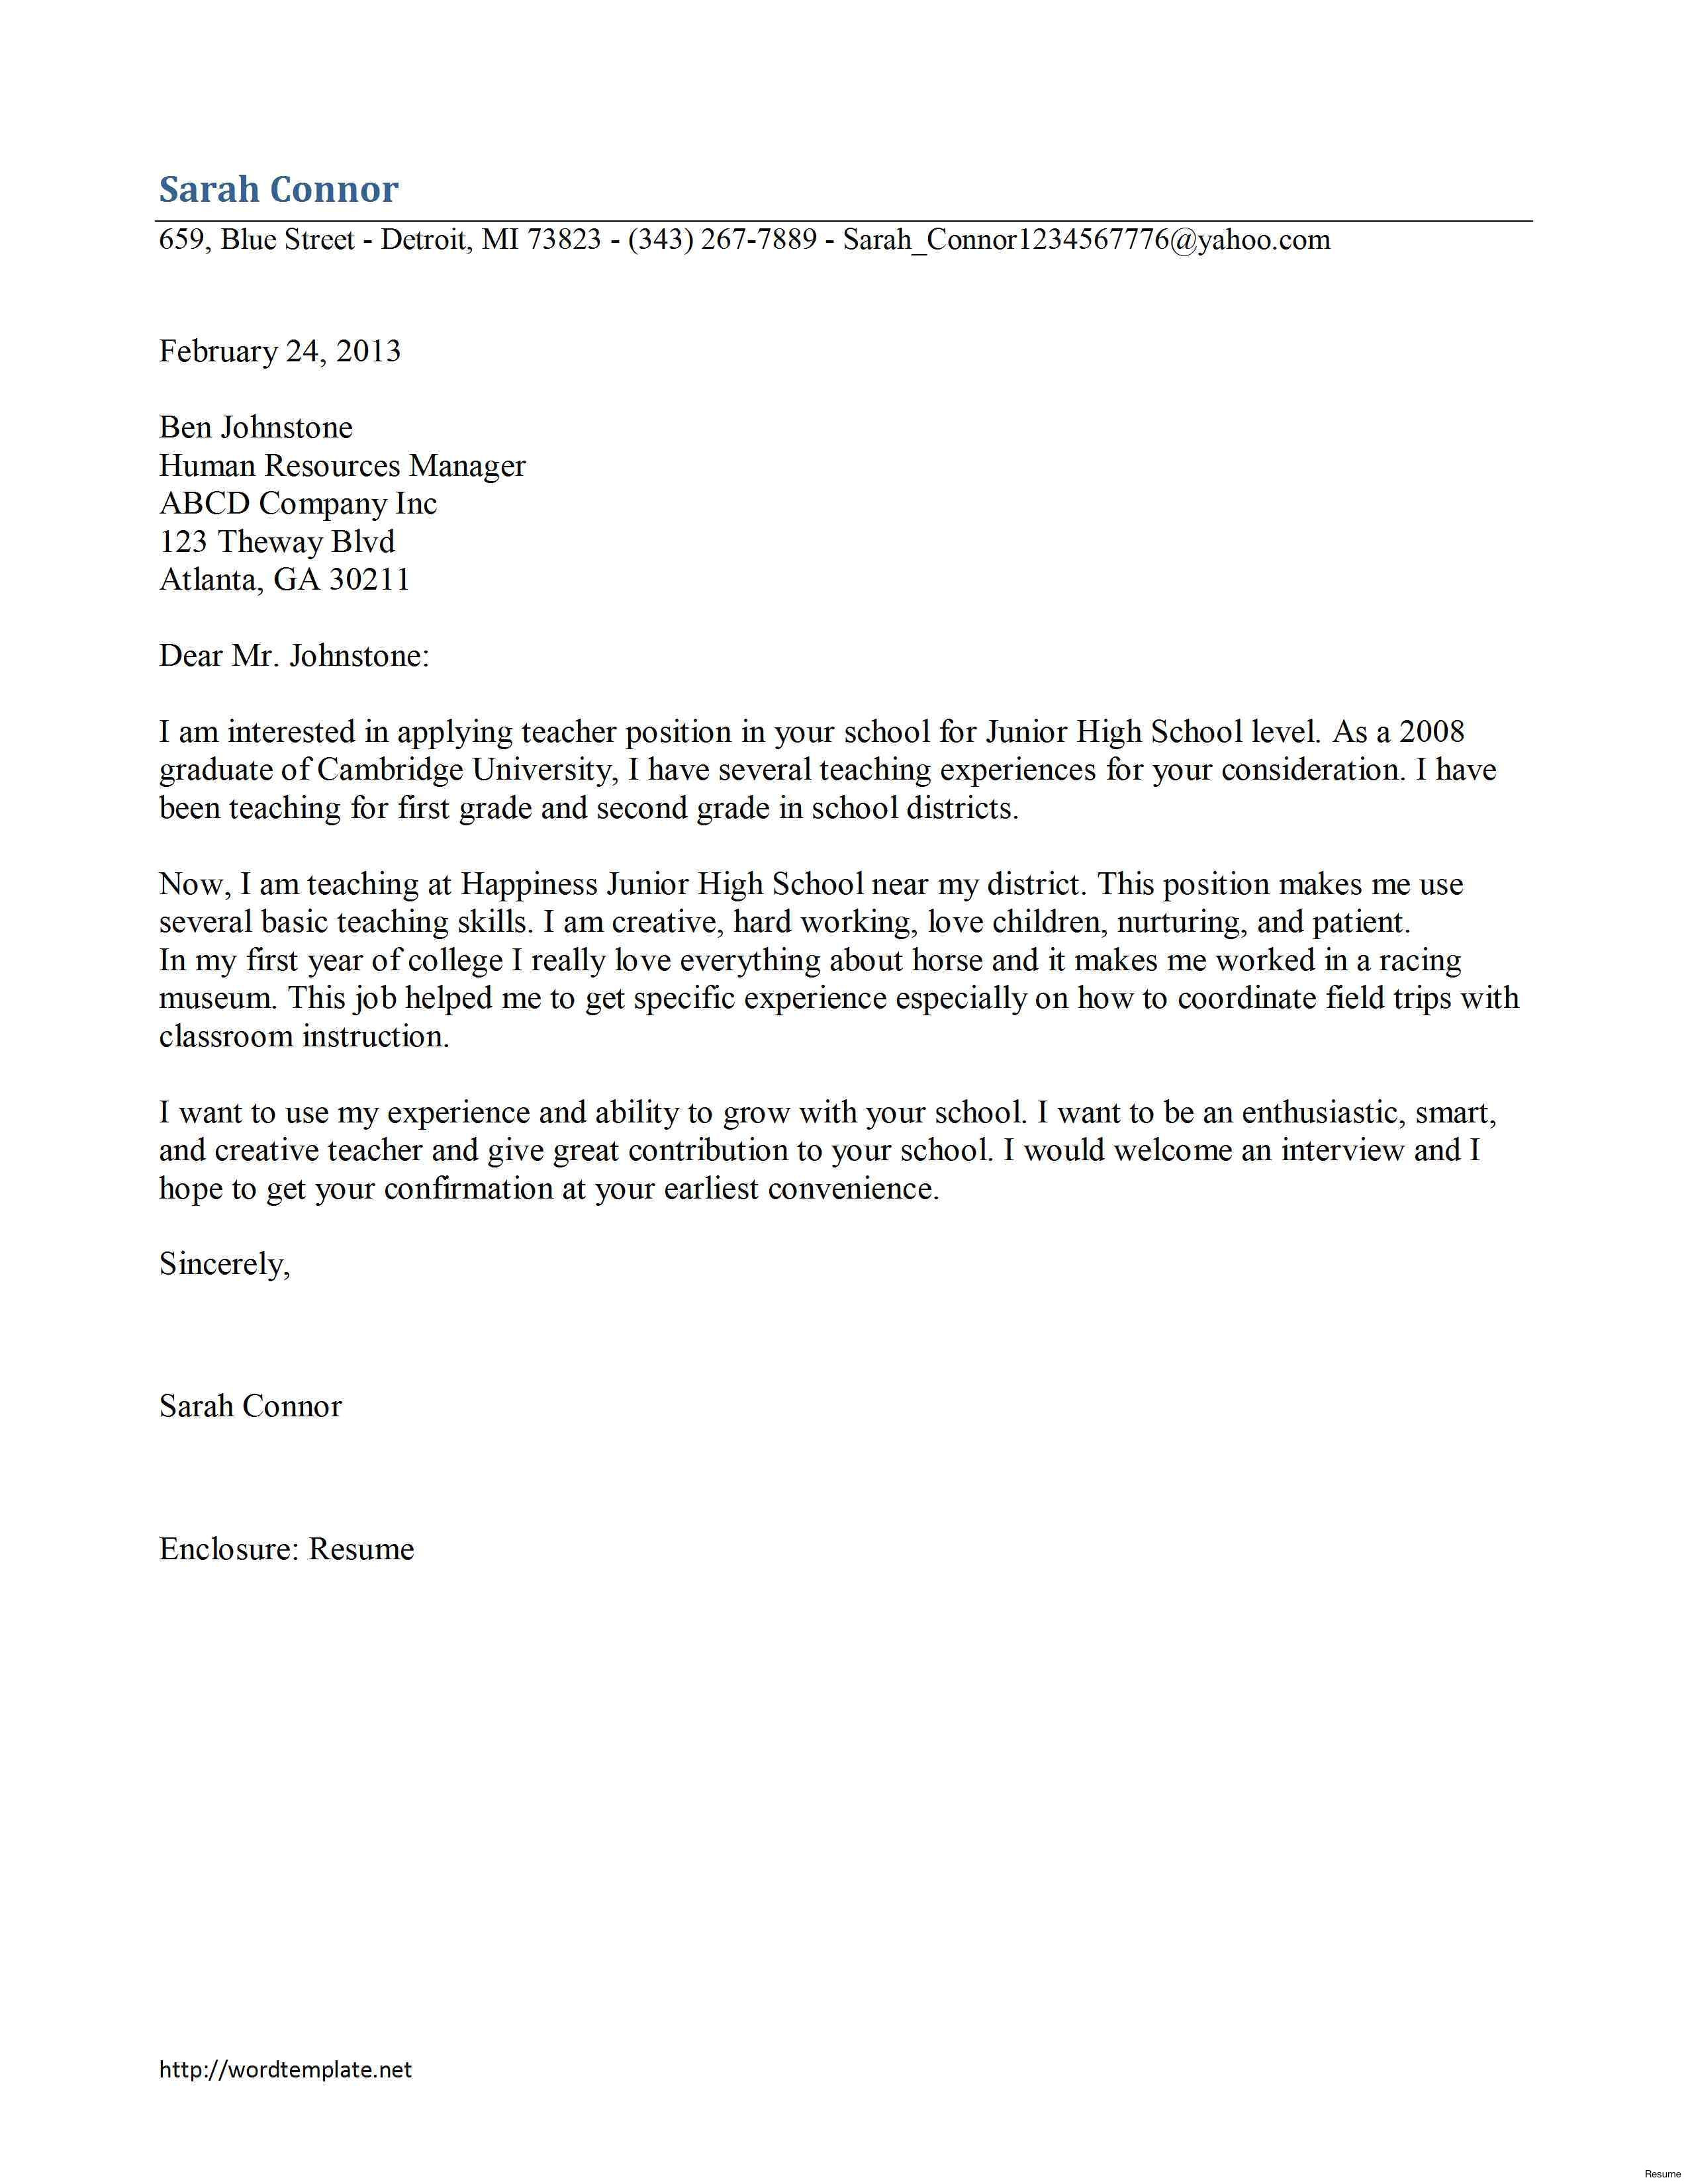 Cover Letter for High School Teaching Position High School Teaching Cover Letter Examples